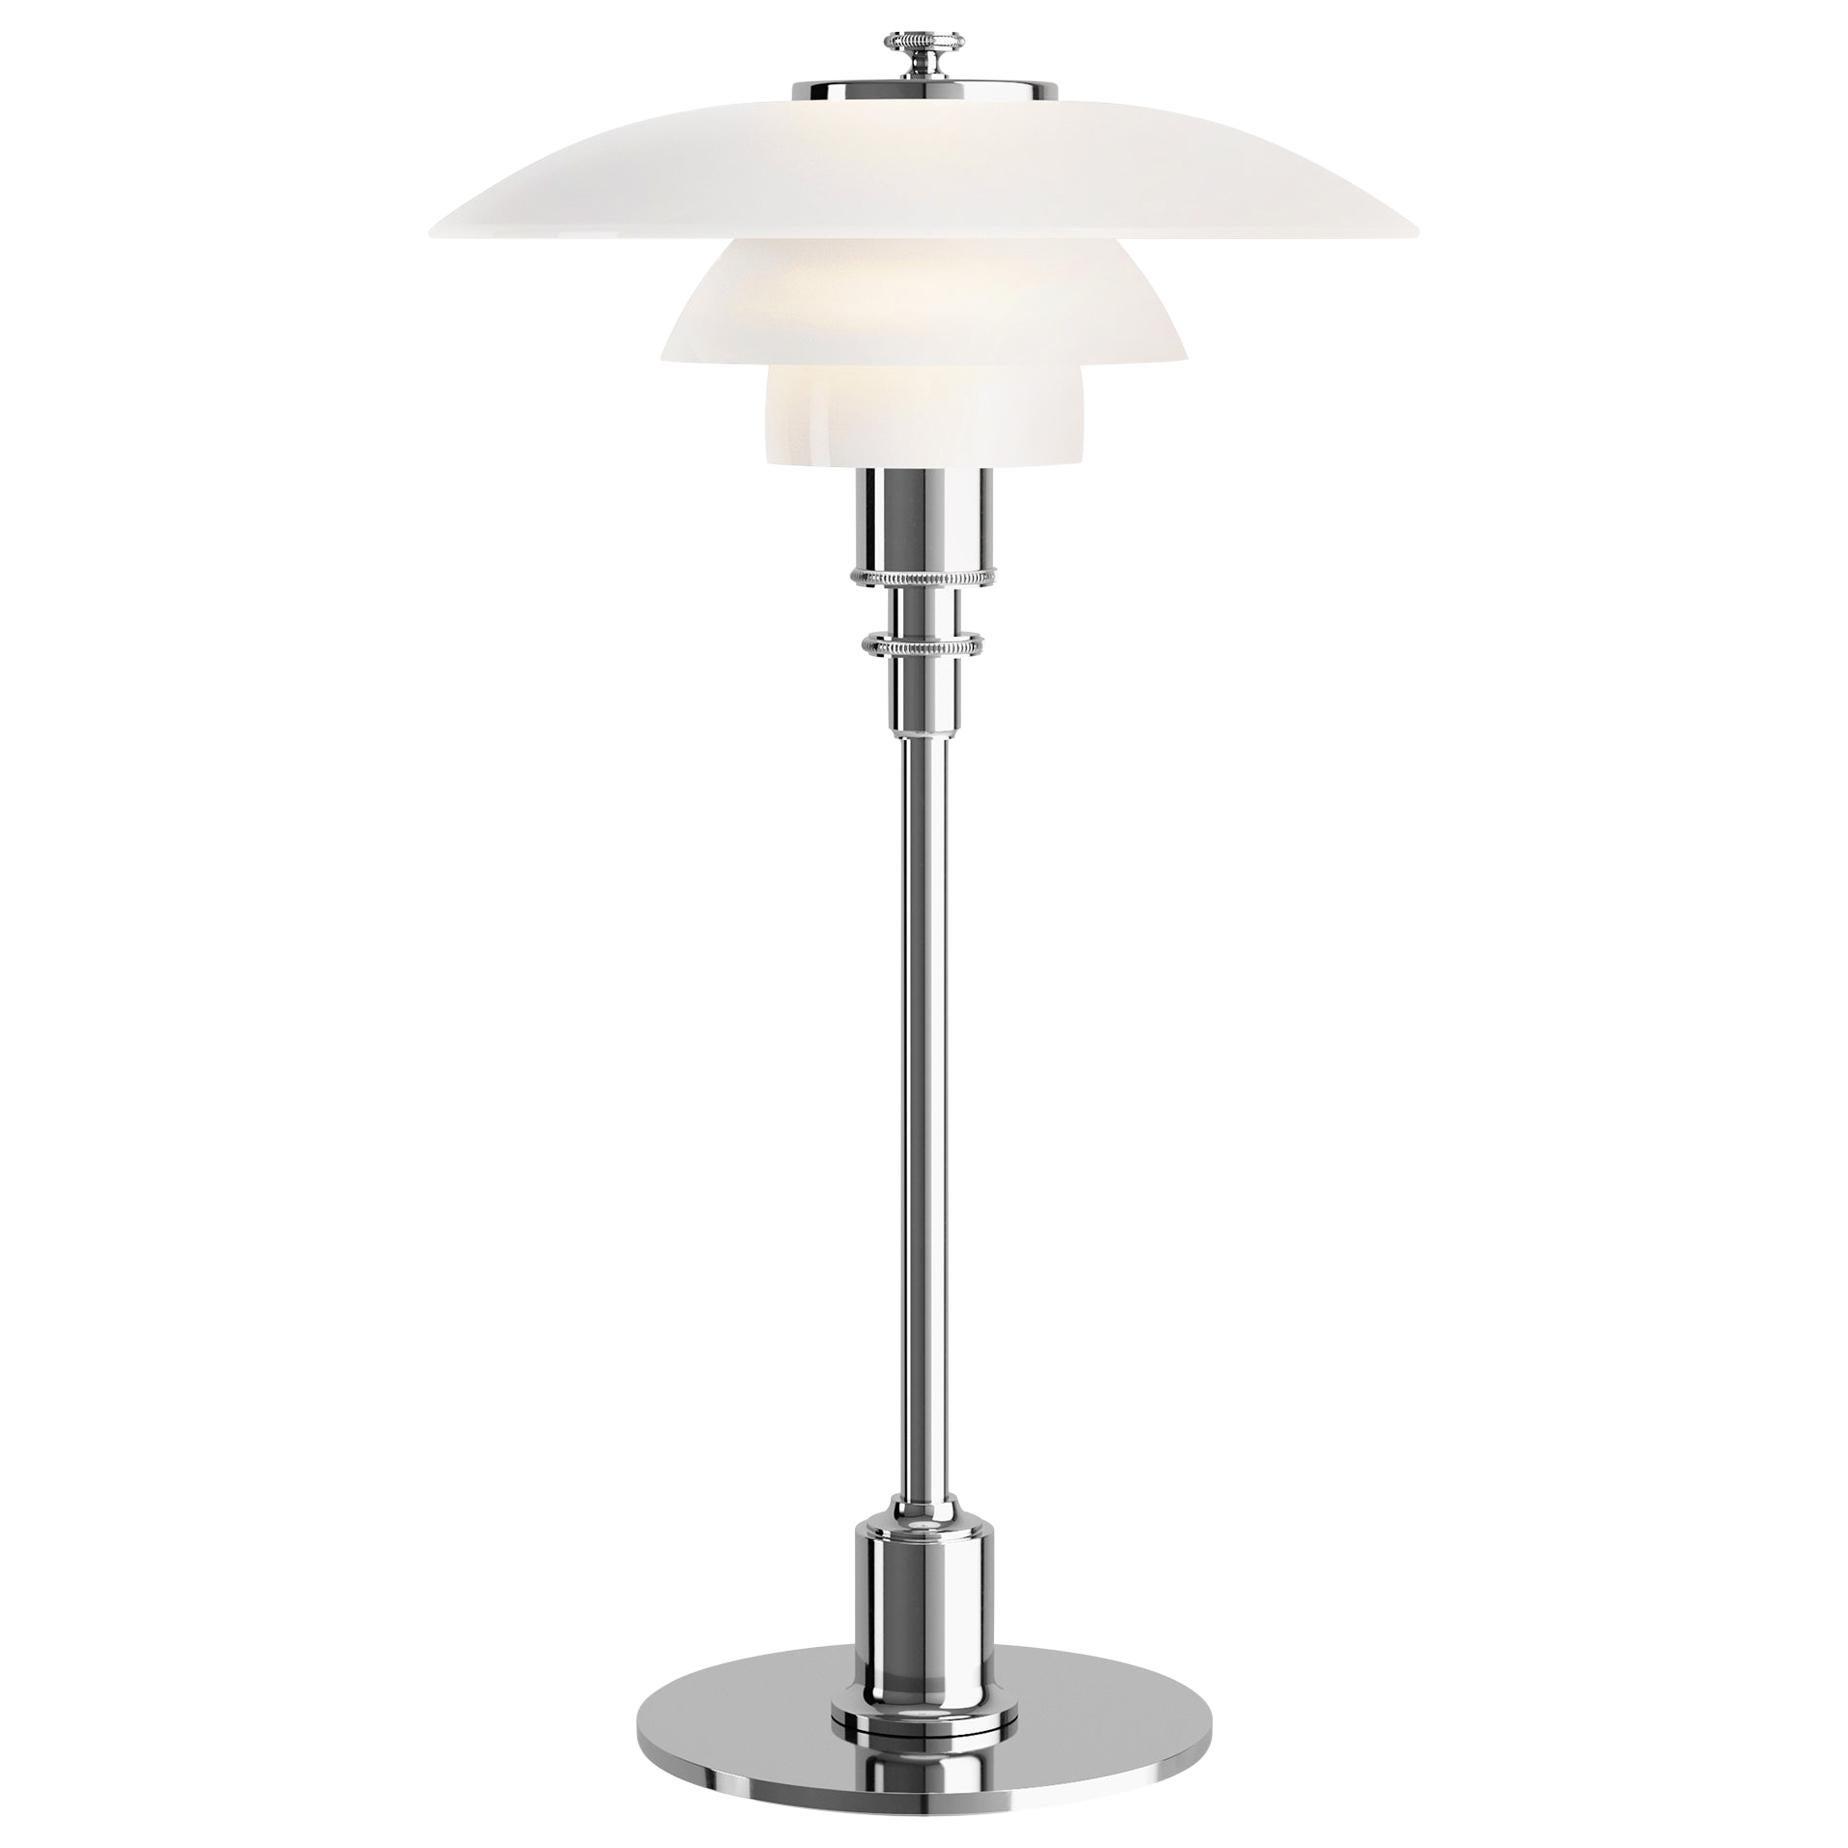 Poul Henningsen Chrome and Glass PH 2/1 Table Lamp for Louis Poulsen